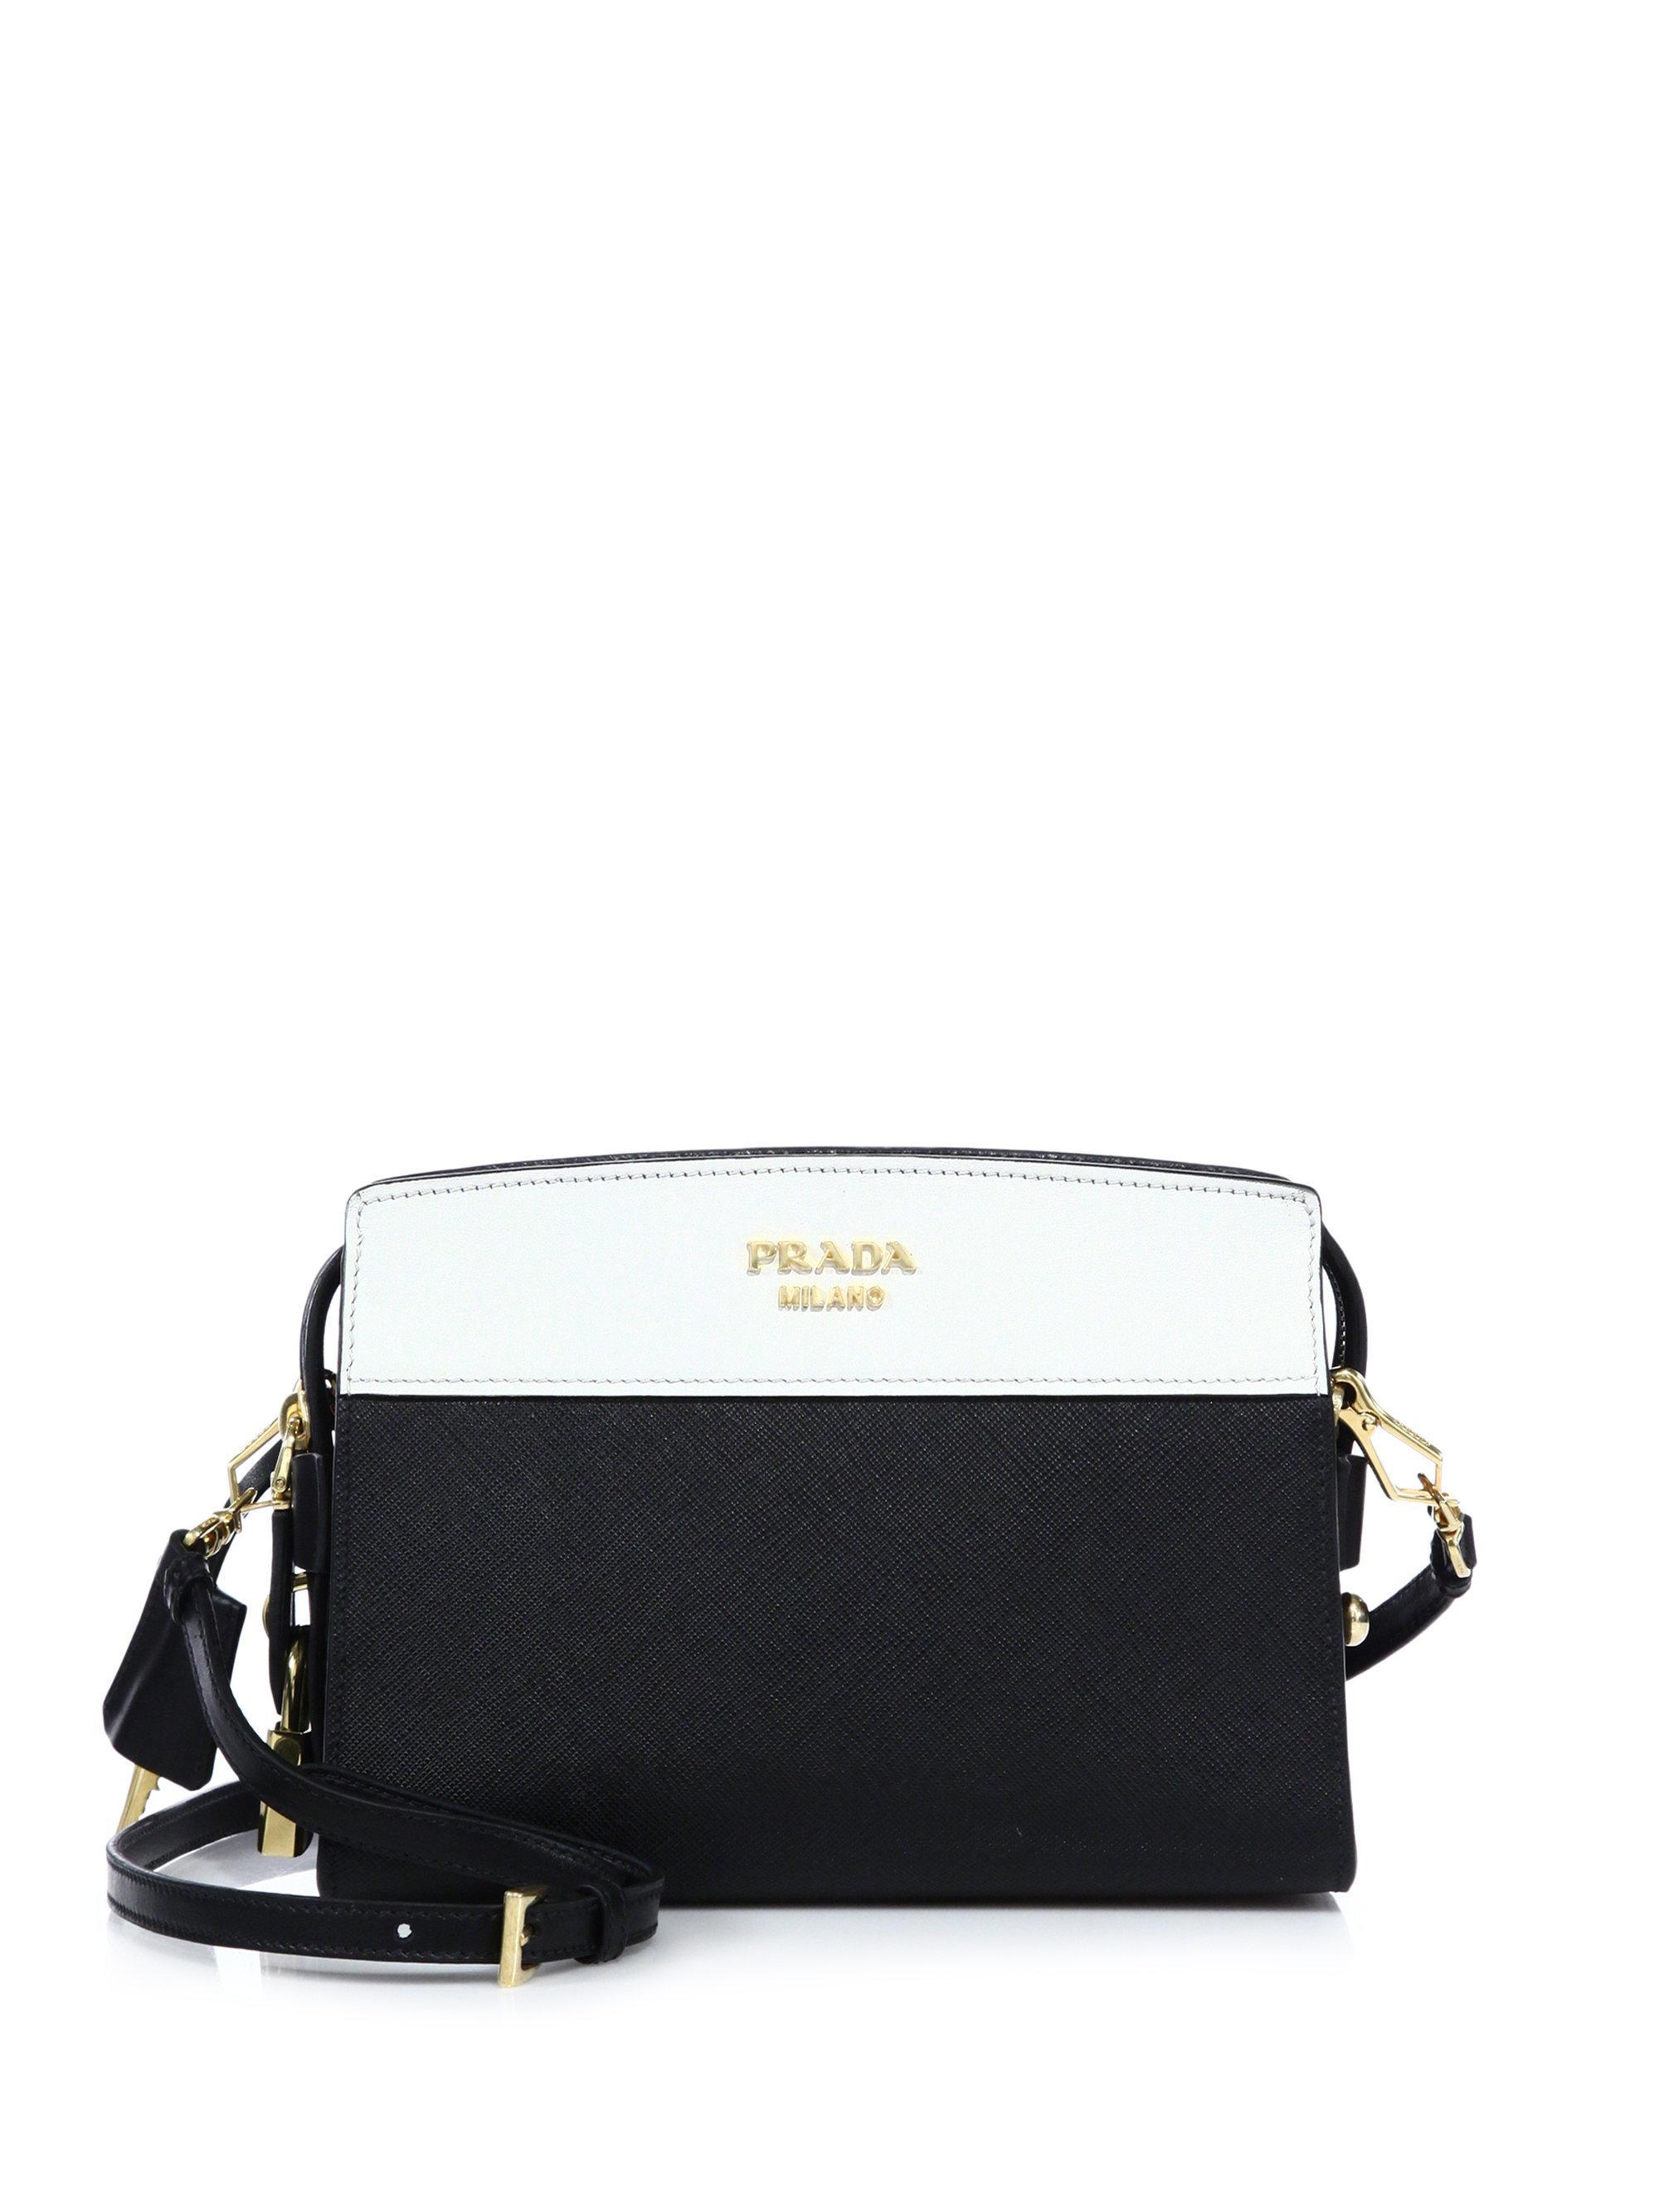 1feb3db28ef6 ... buy prada black esplanade leather shoulder bag lyst. view fullscreen  bc379 b8aca